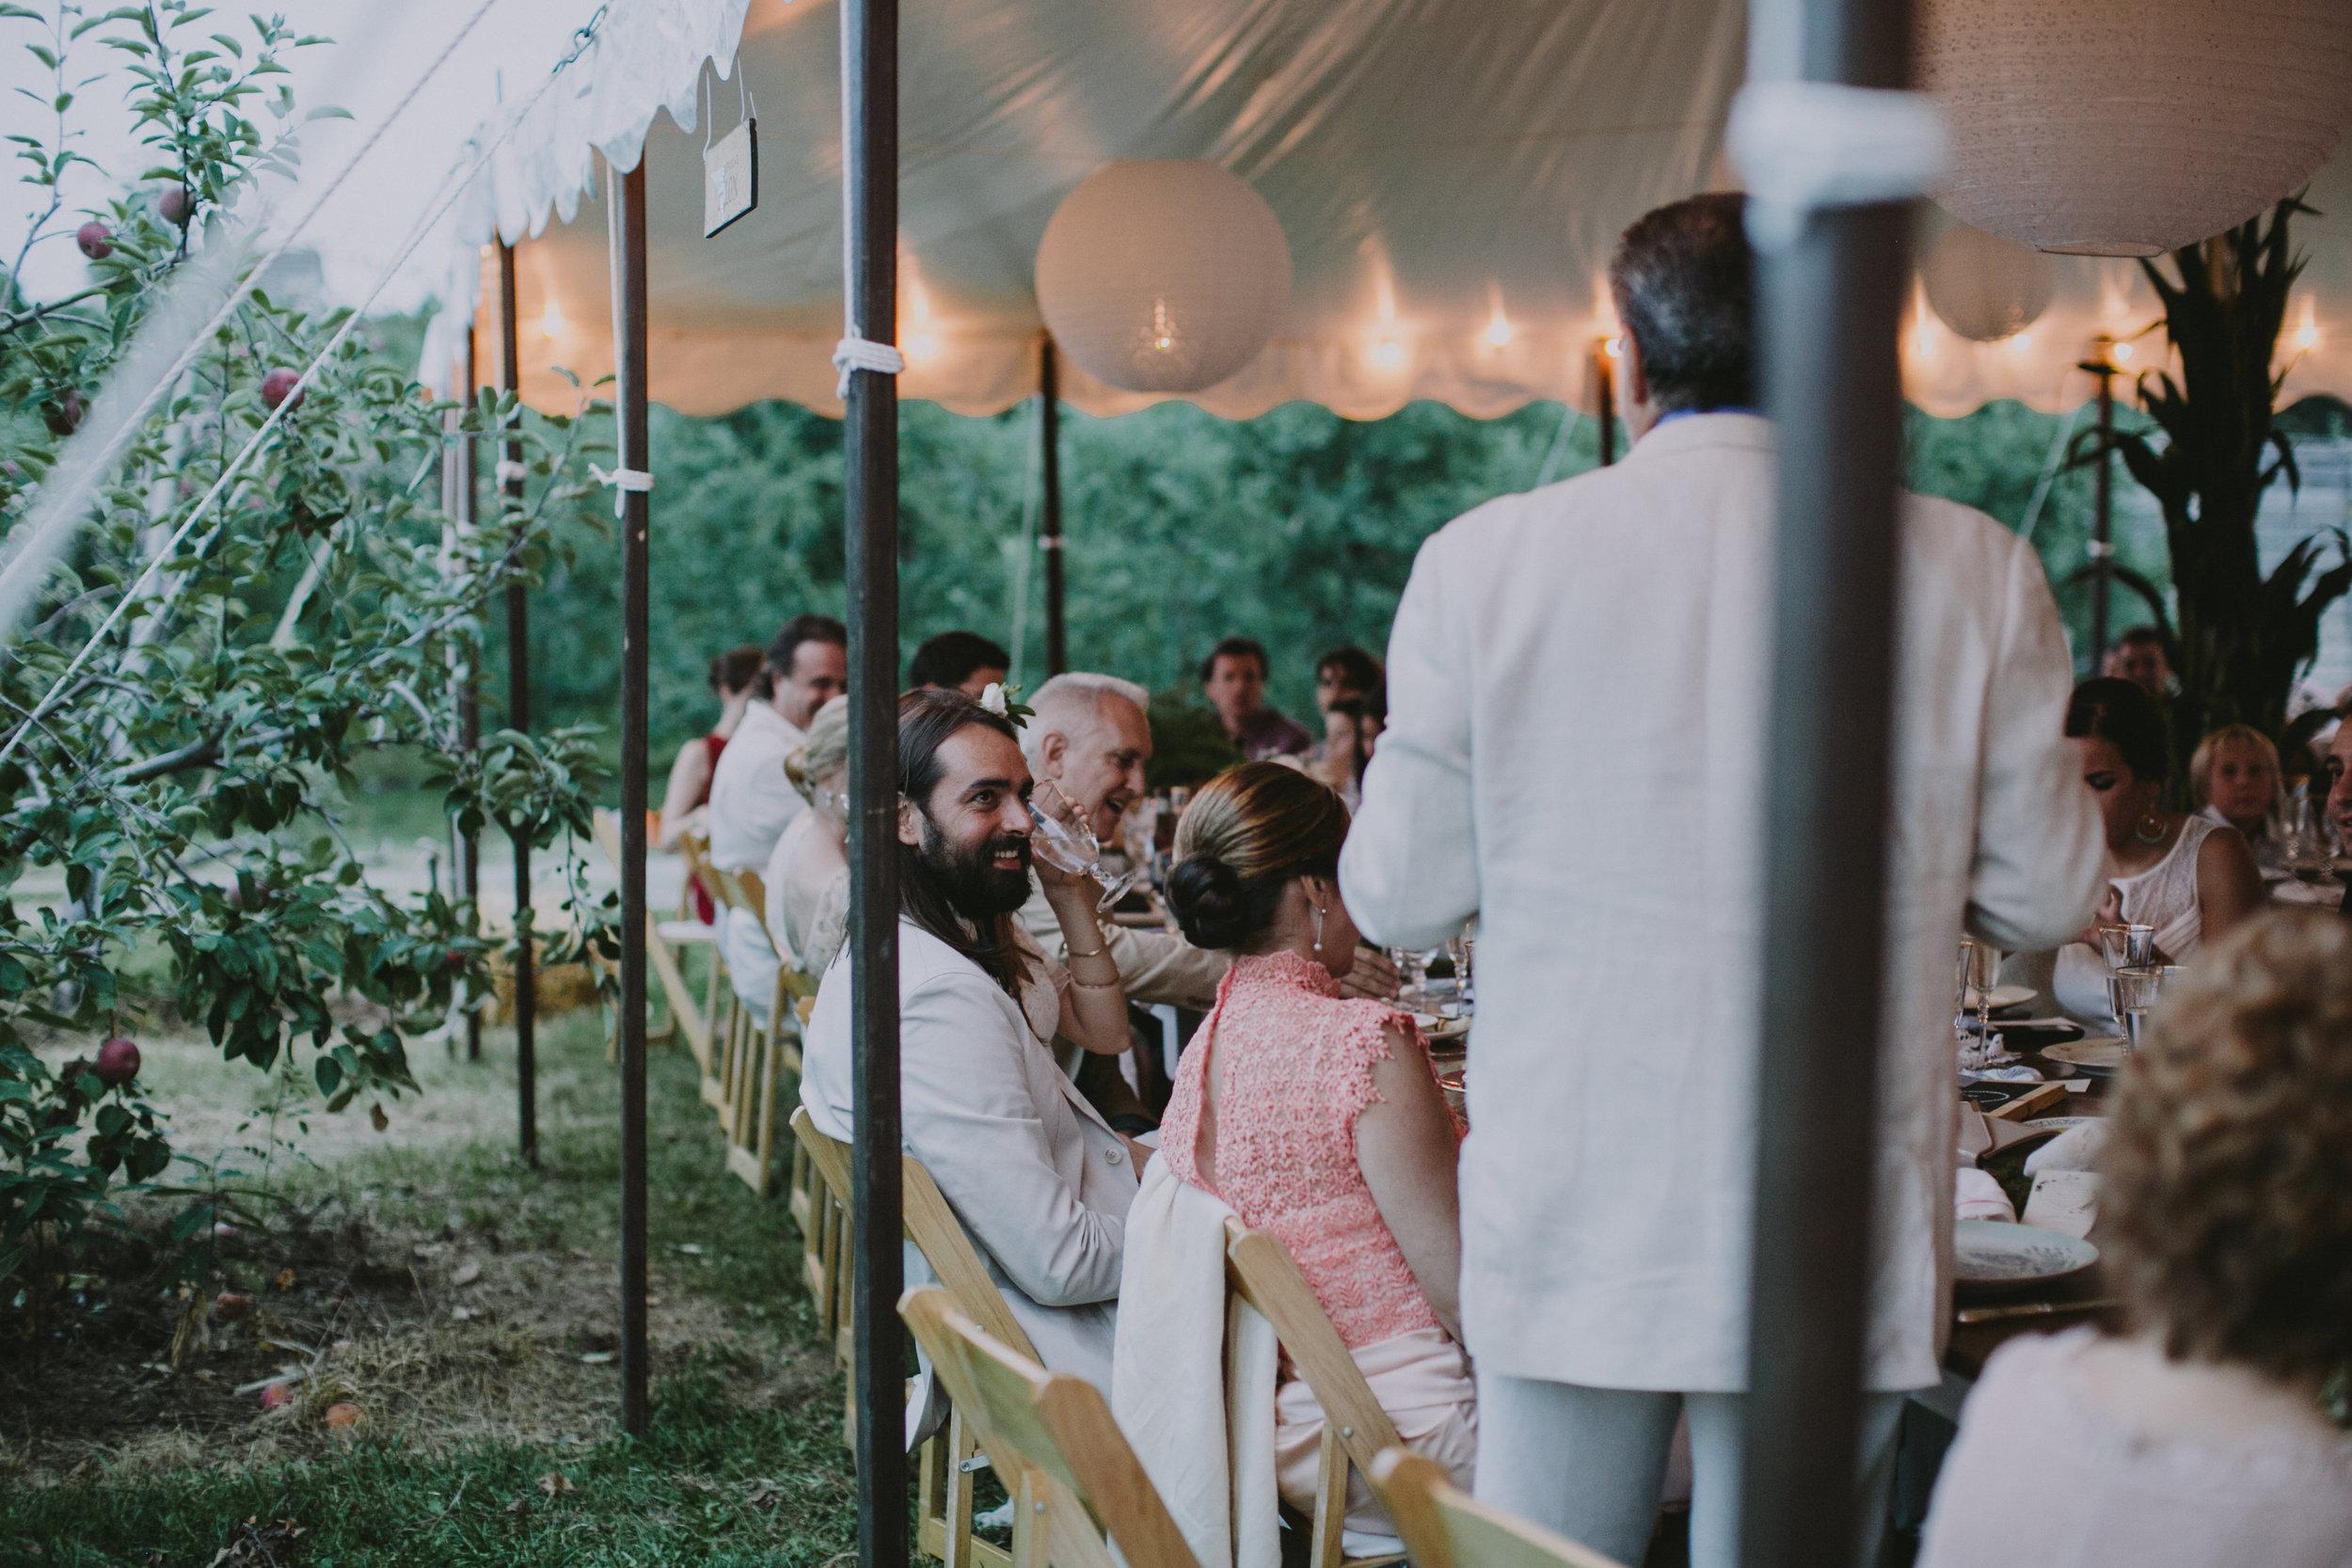 LIBERTY_VIEW_FARM_HIGHLAND_NY_WEDDING_CHELLISE_MICHAEL_PHOTOGRAPHY865.JPG